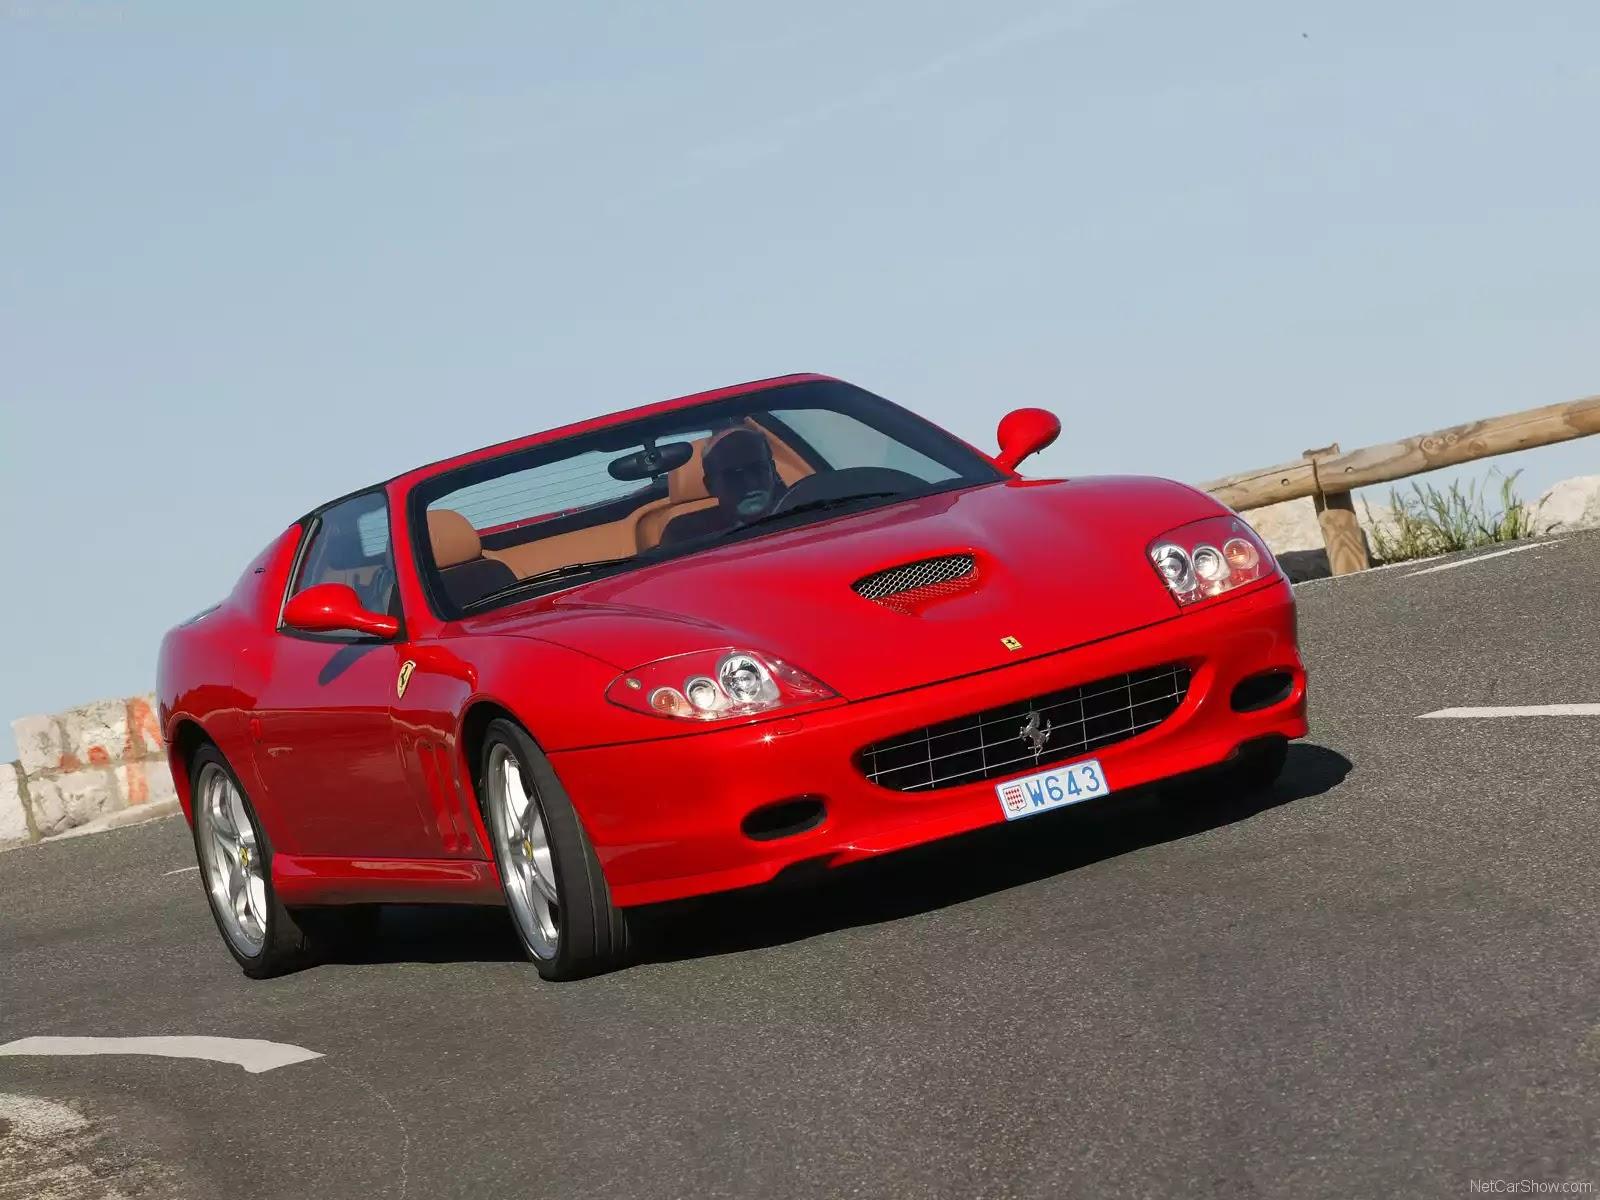 Hình ảnh siêu xe Ferrari 575M Superamerica 2005 & nội ngoại thất